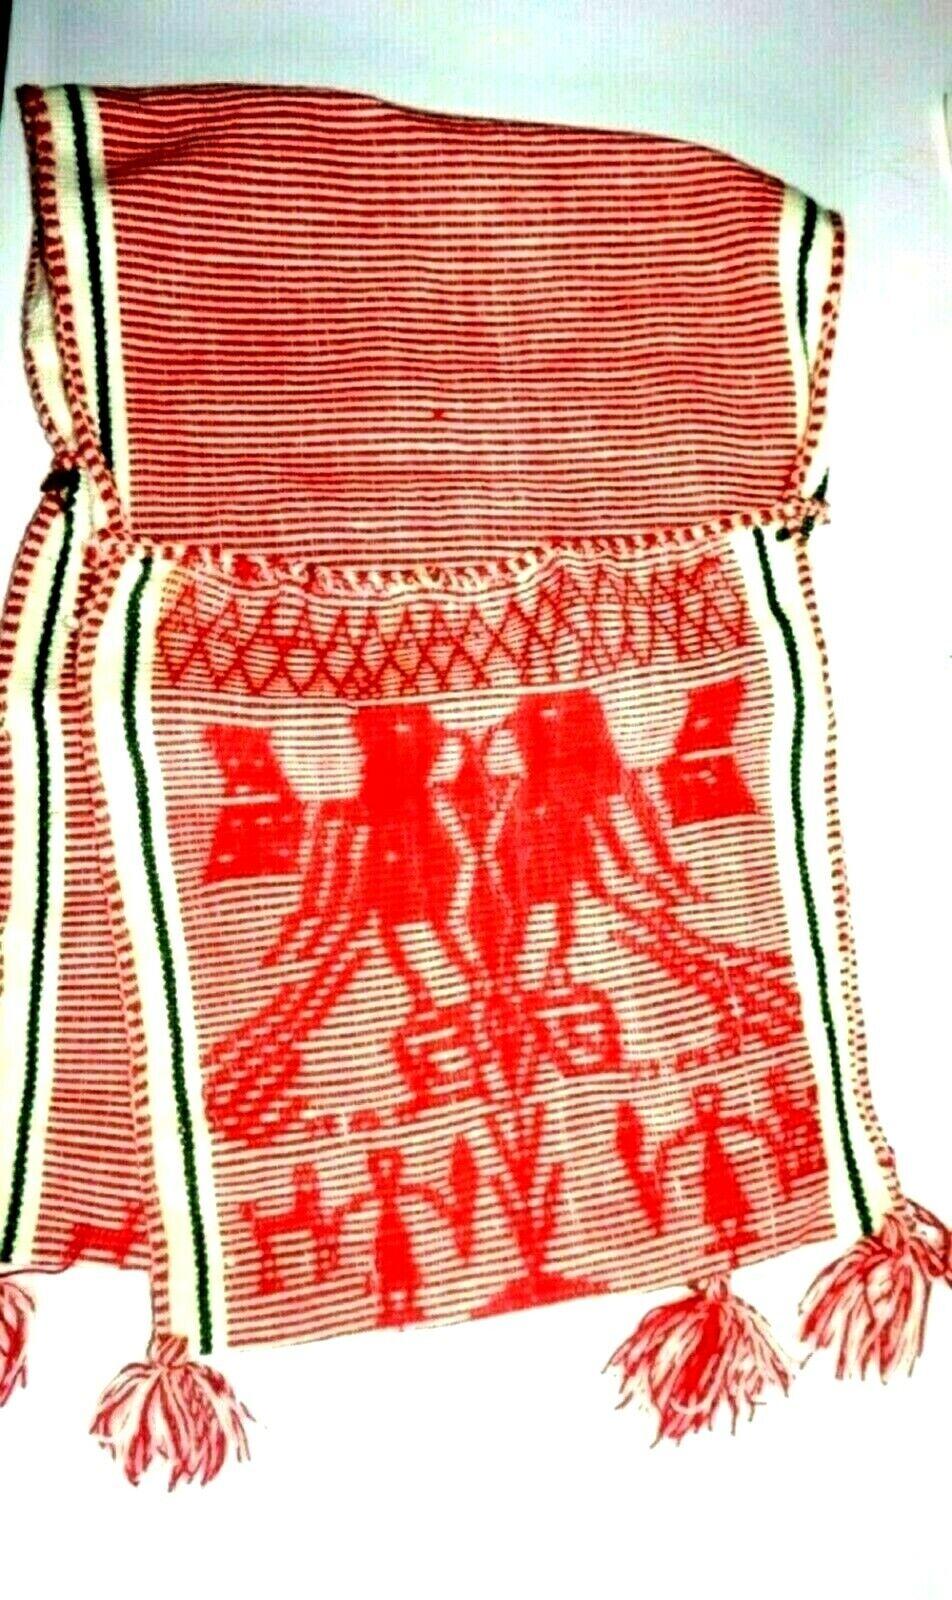 Peruvian andean shaman ceremony chuspa - Cusco andean communities-Double Chuspa